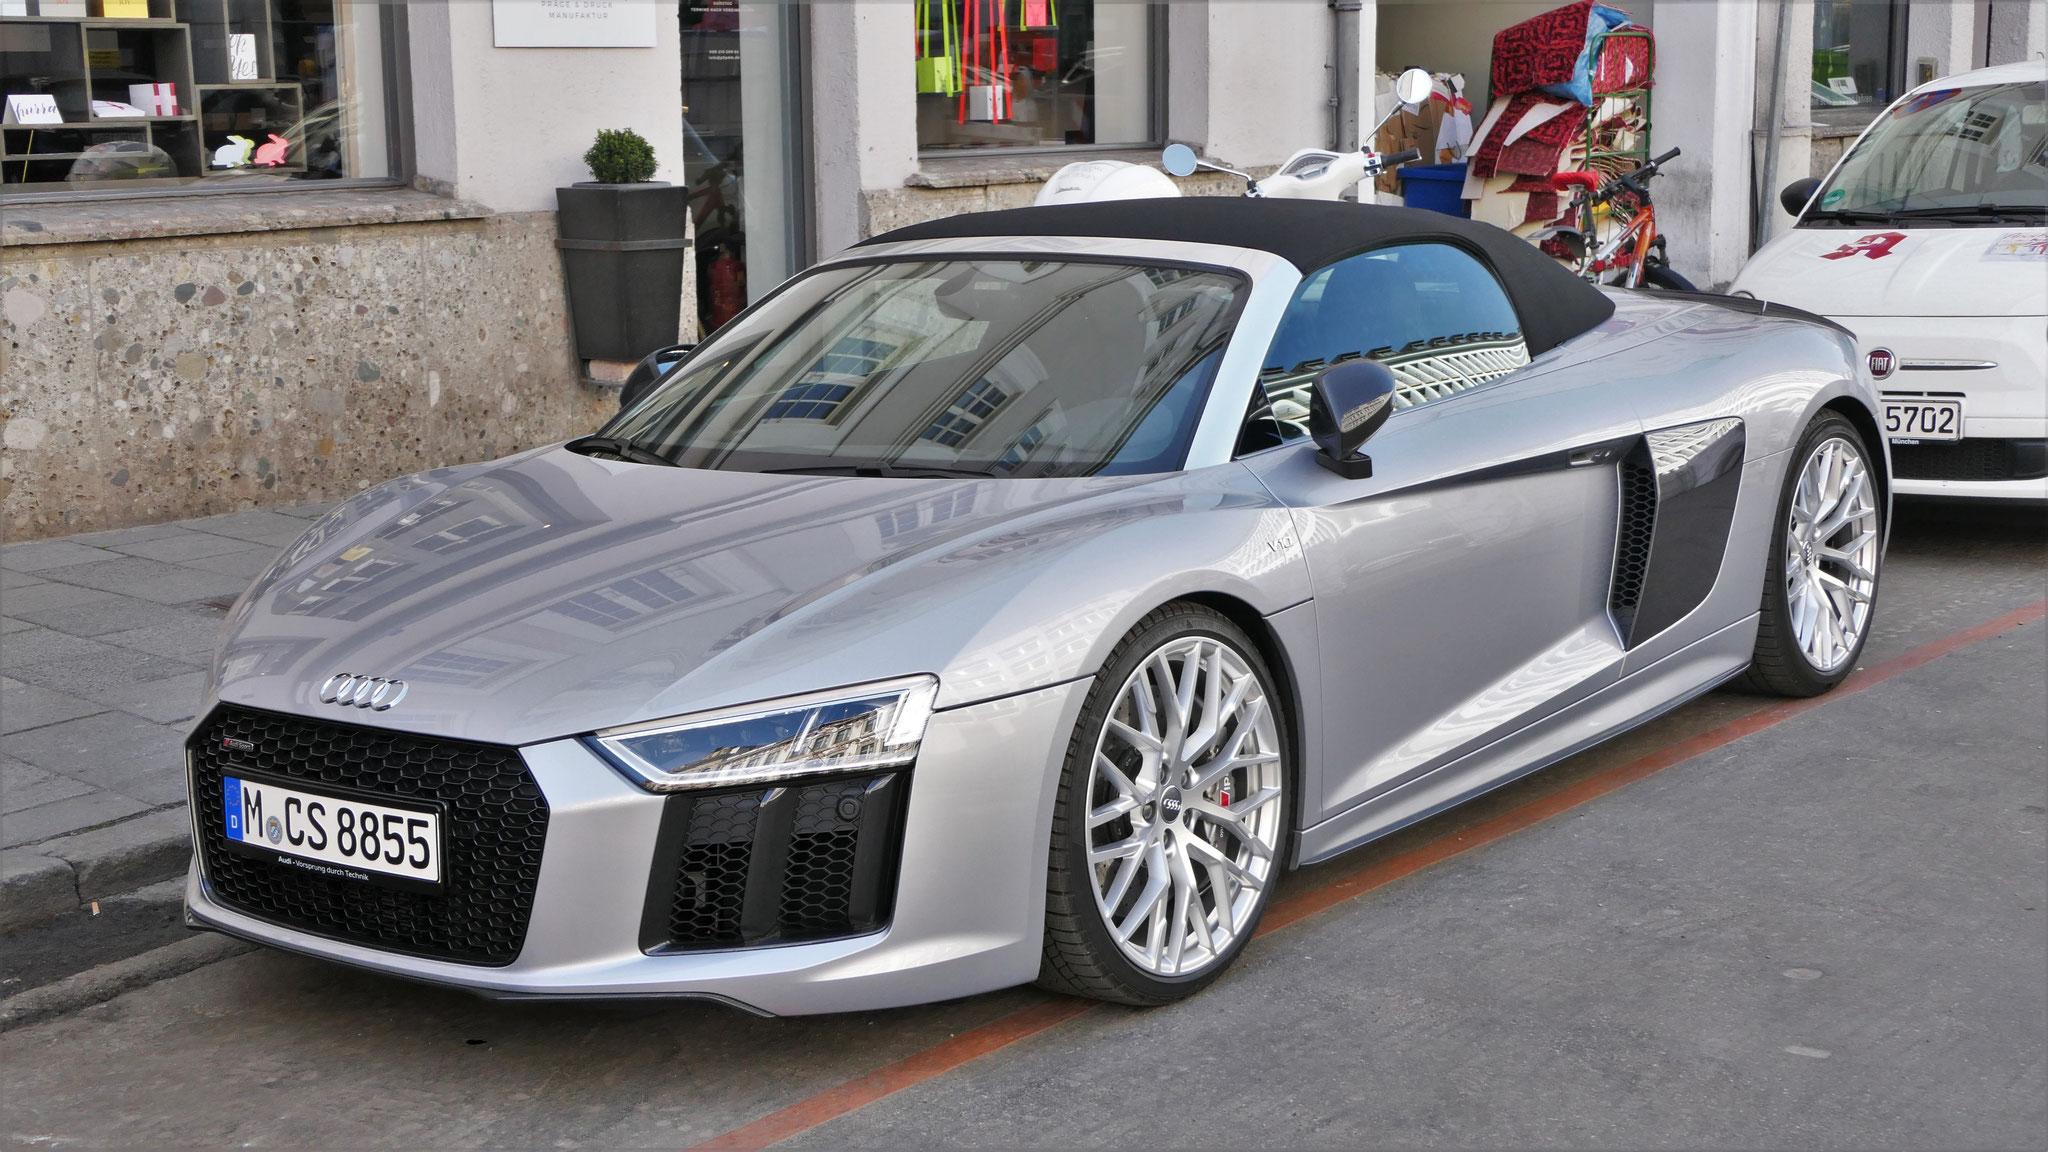 Audi R8 V10 Spyder - M-CS-8855